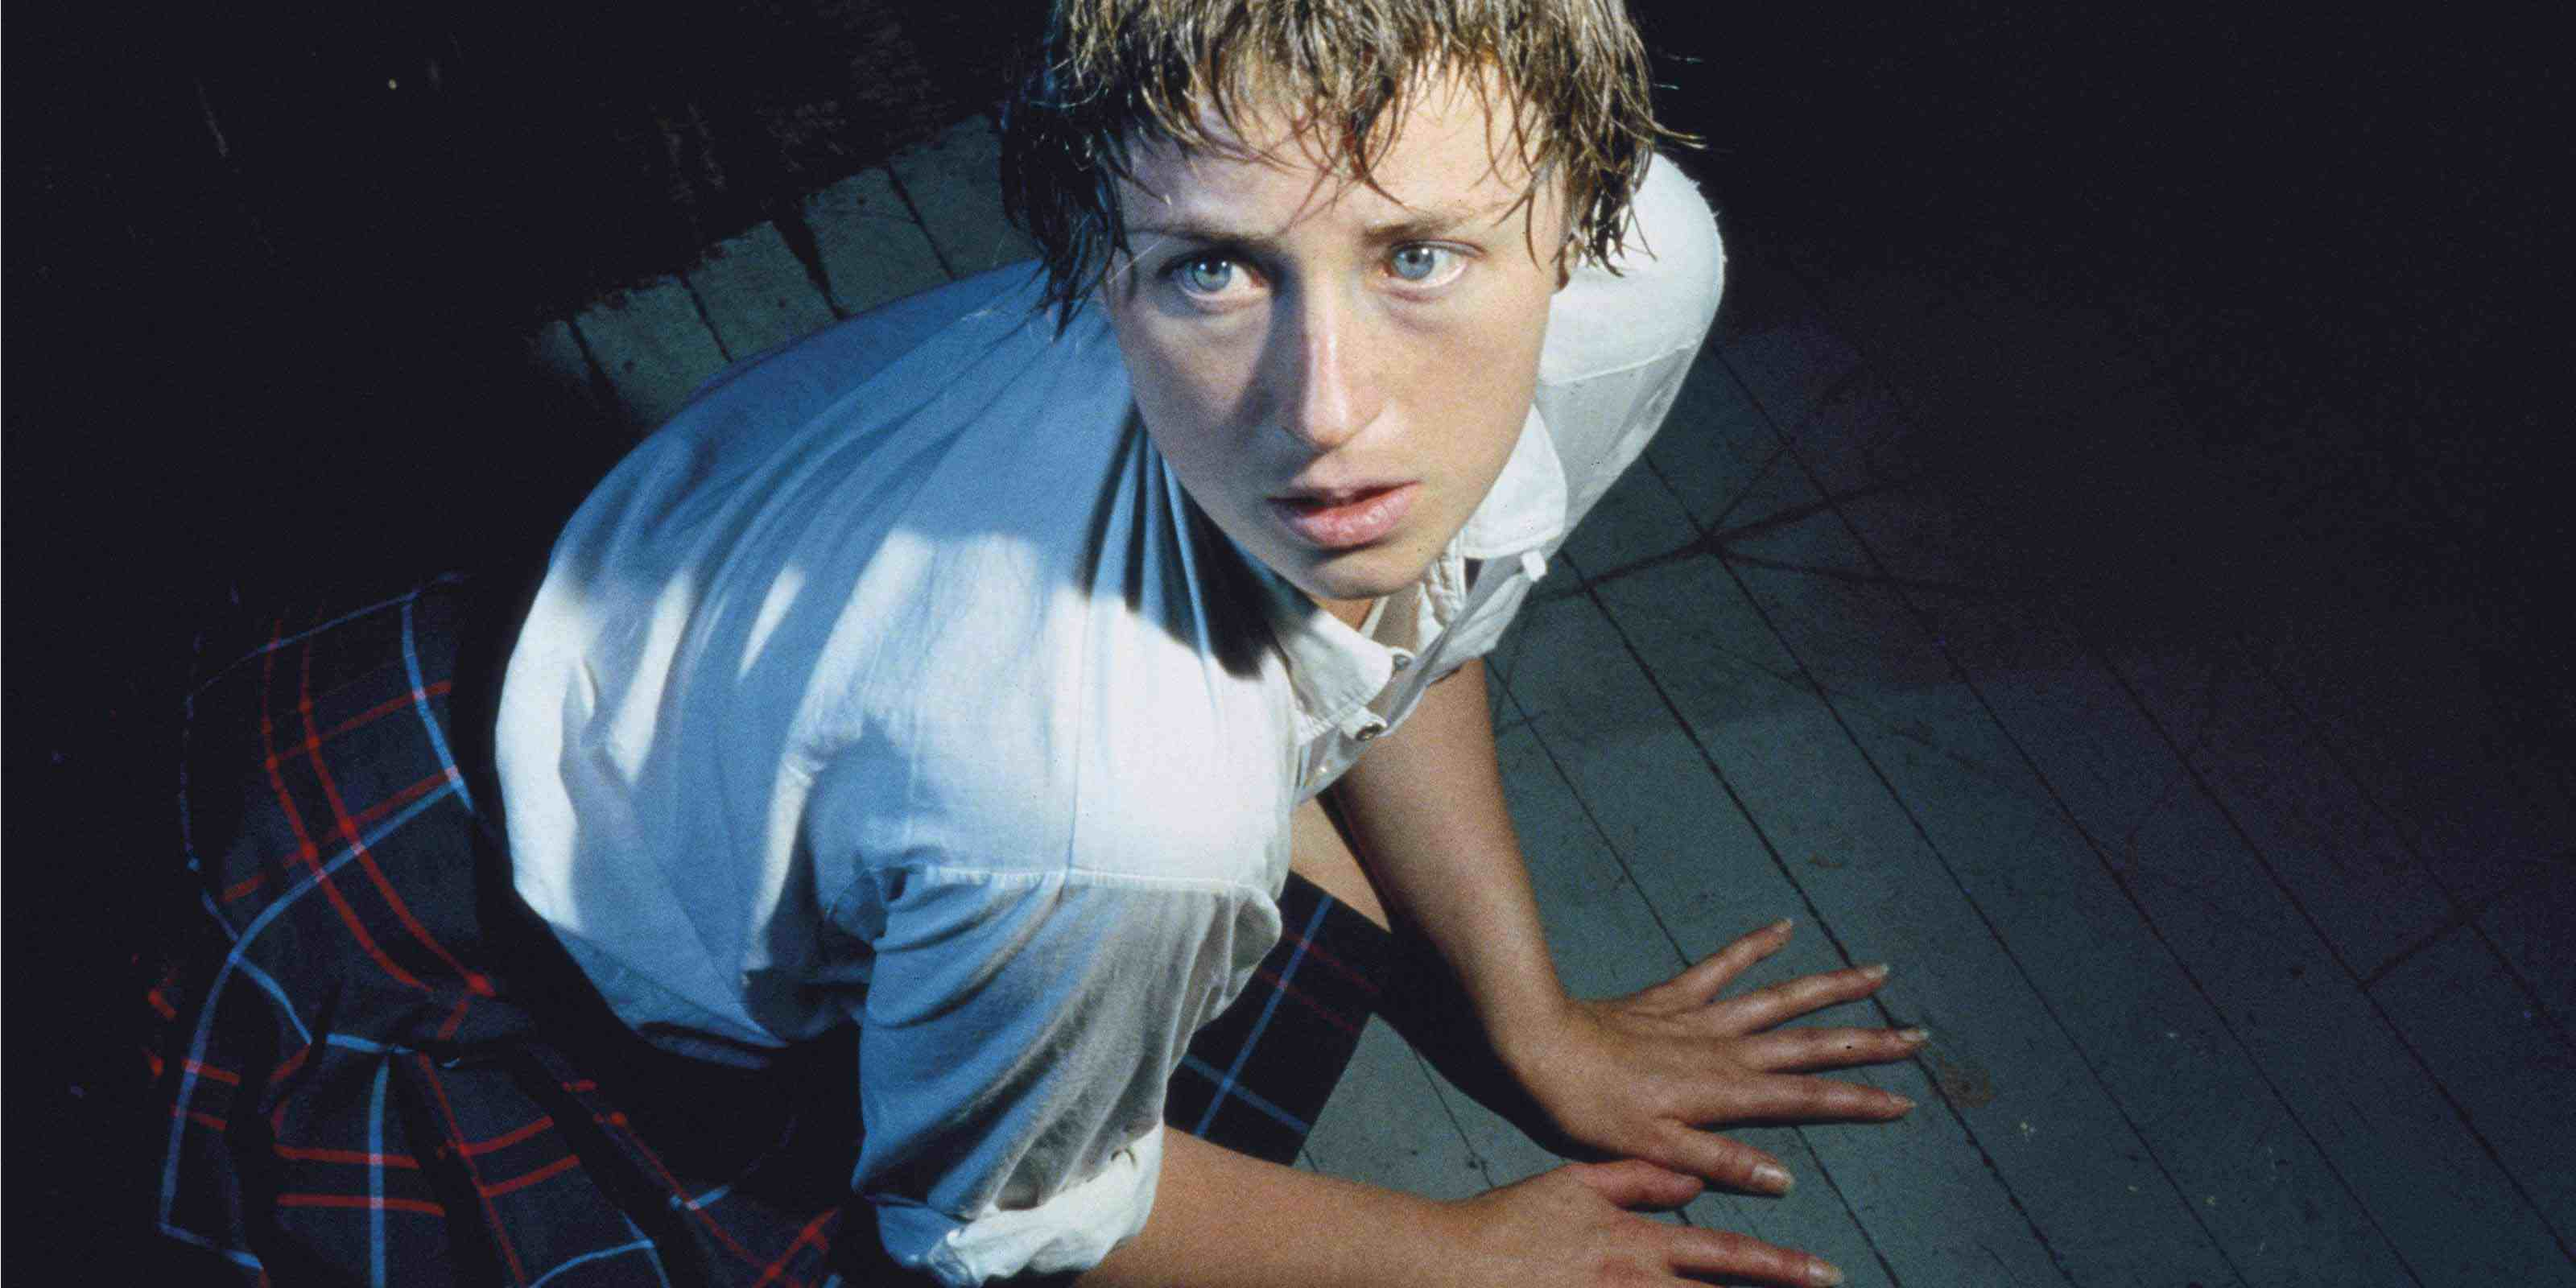 Cindy Sherman, Untitled #92 (1981)